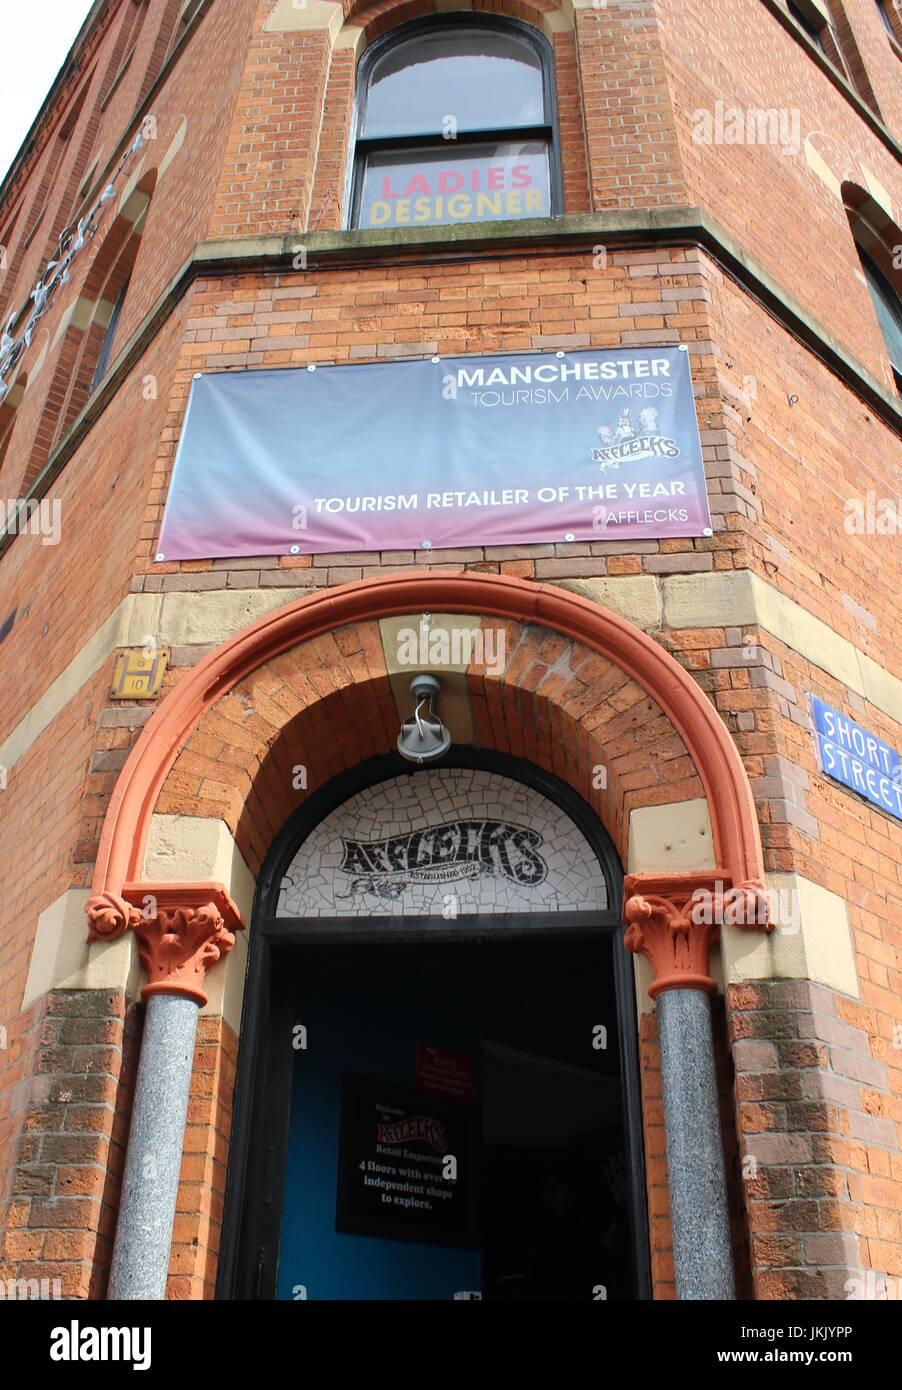 Afflecks Palace, Manchester - Front Entrance - Stock Image